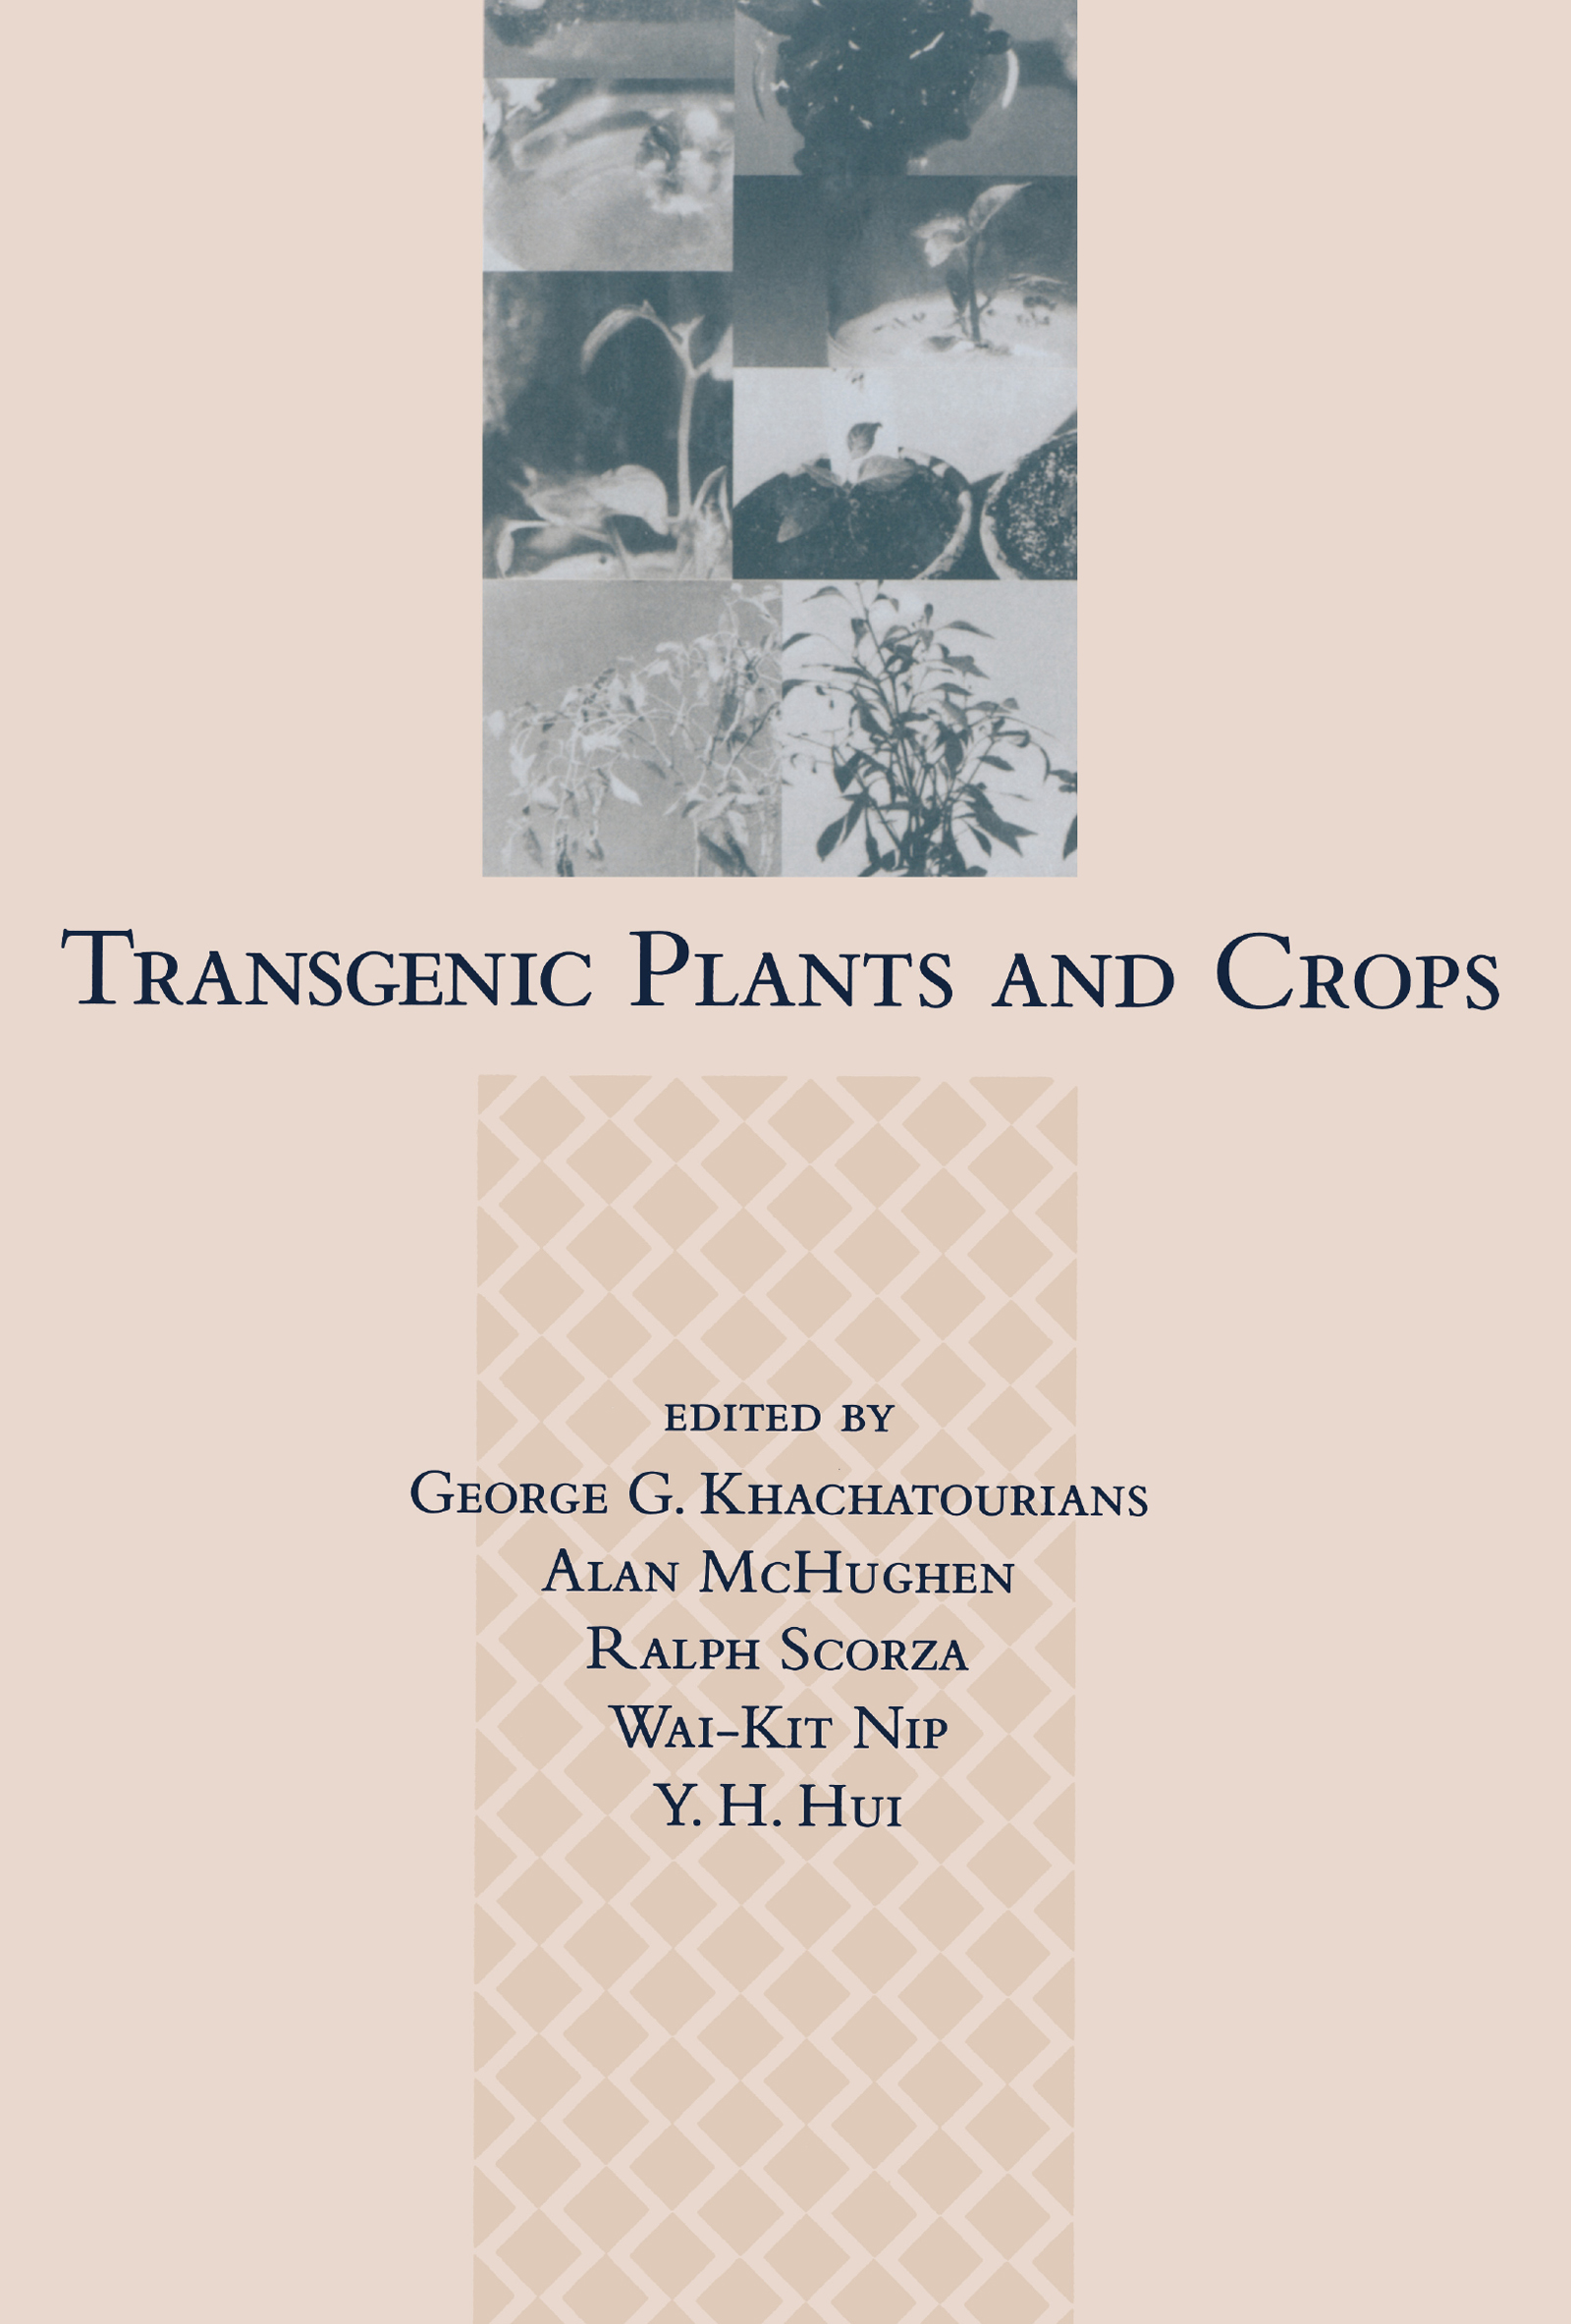 Genetic Engineering for Resistance to Nematodes